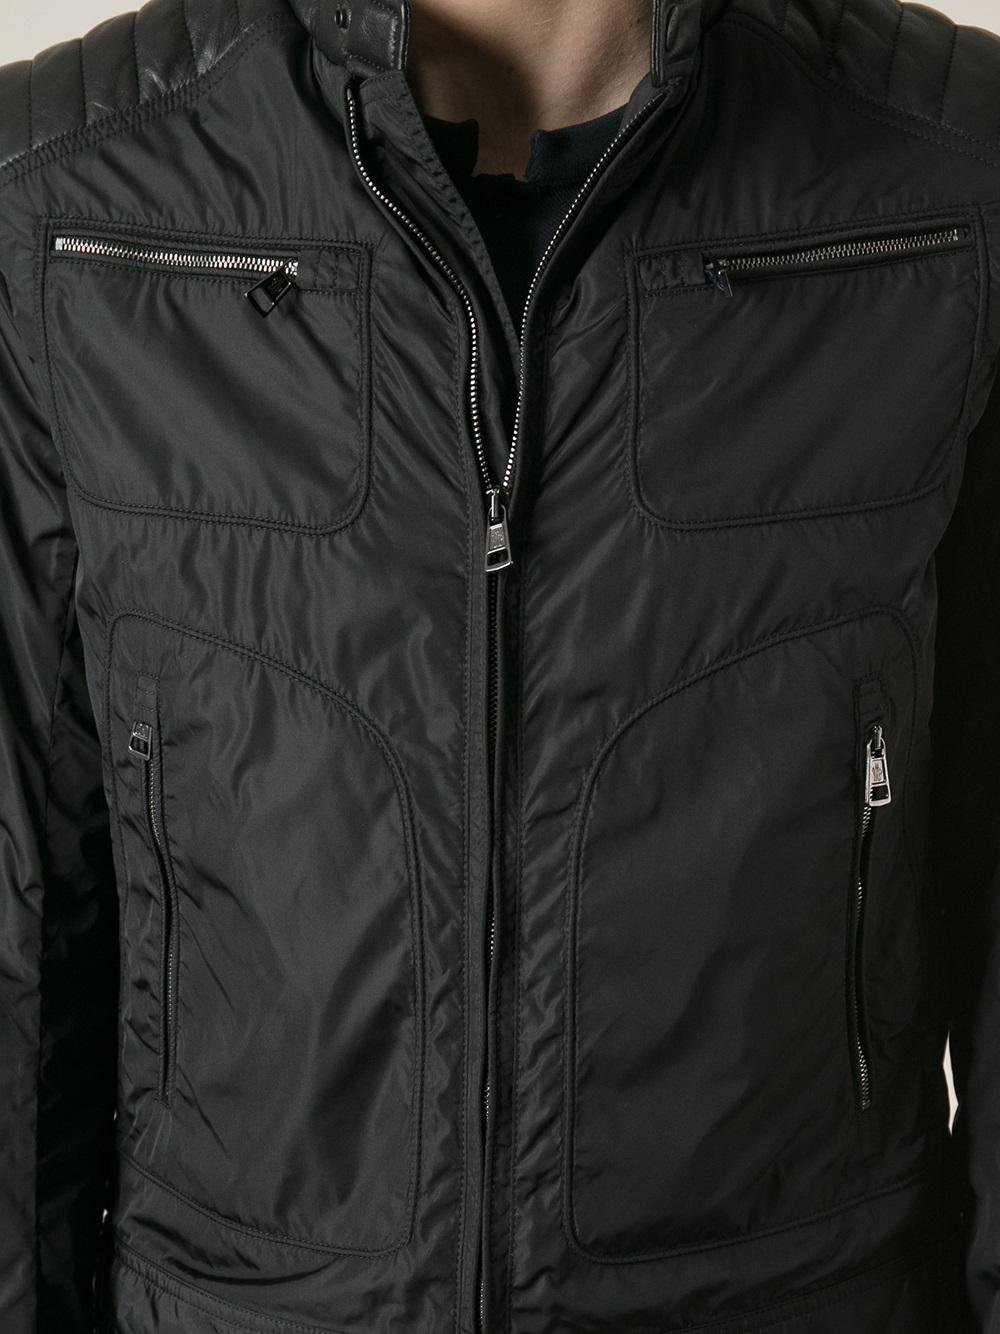 Biker Moncler Jacket Style Lightweight Noir f1wOnUq